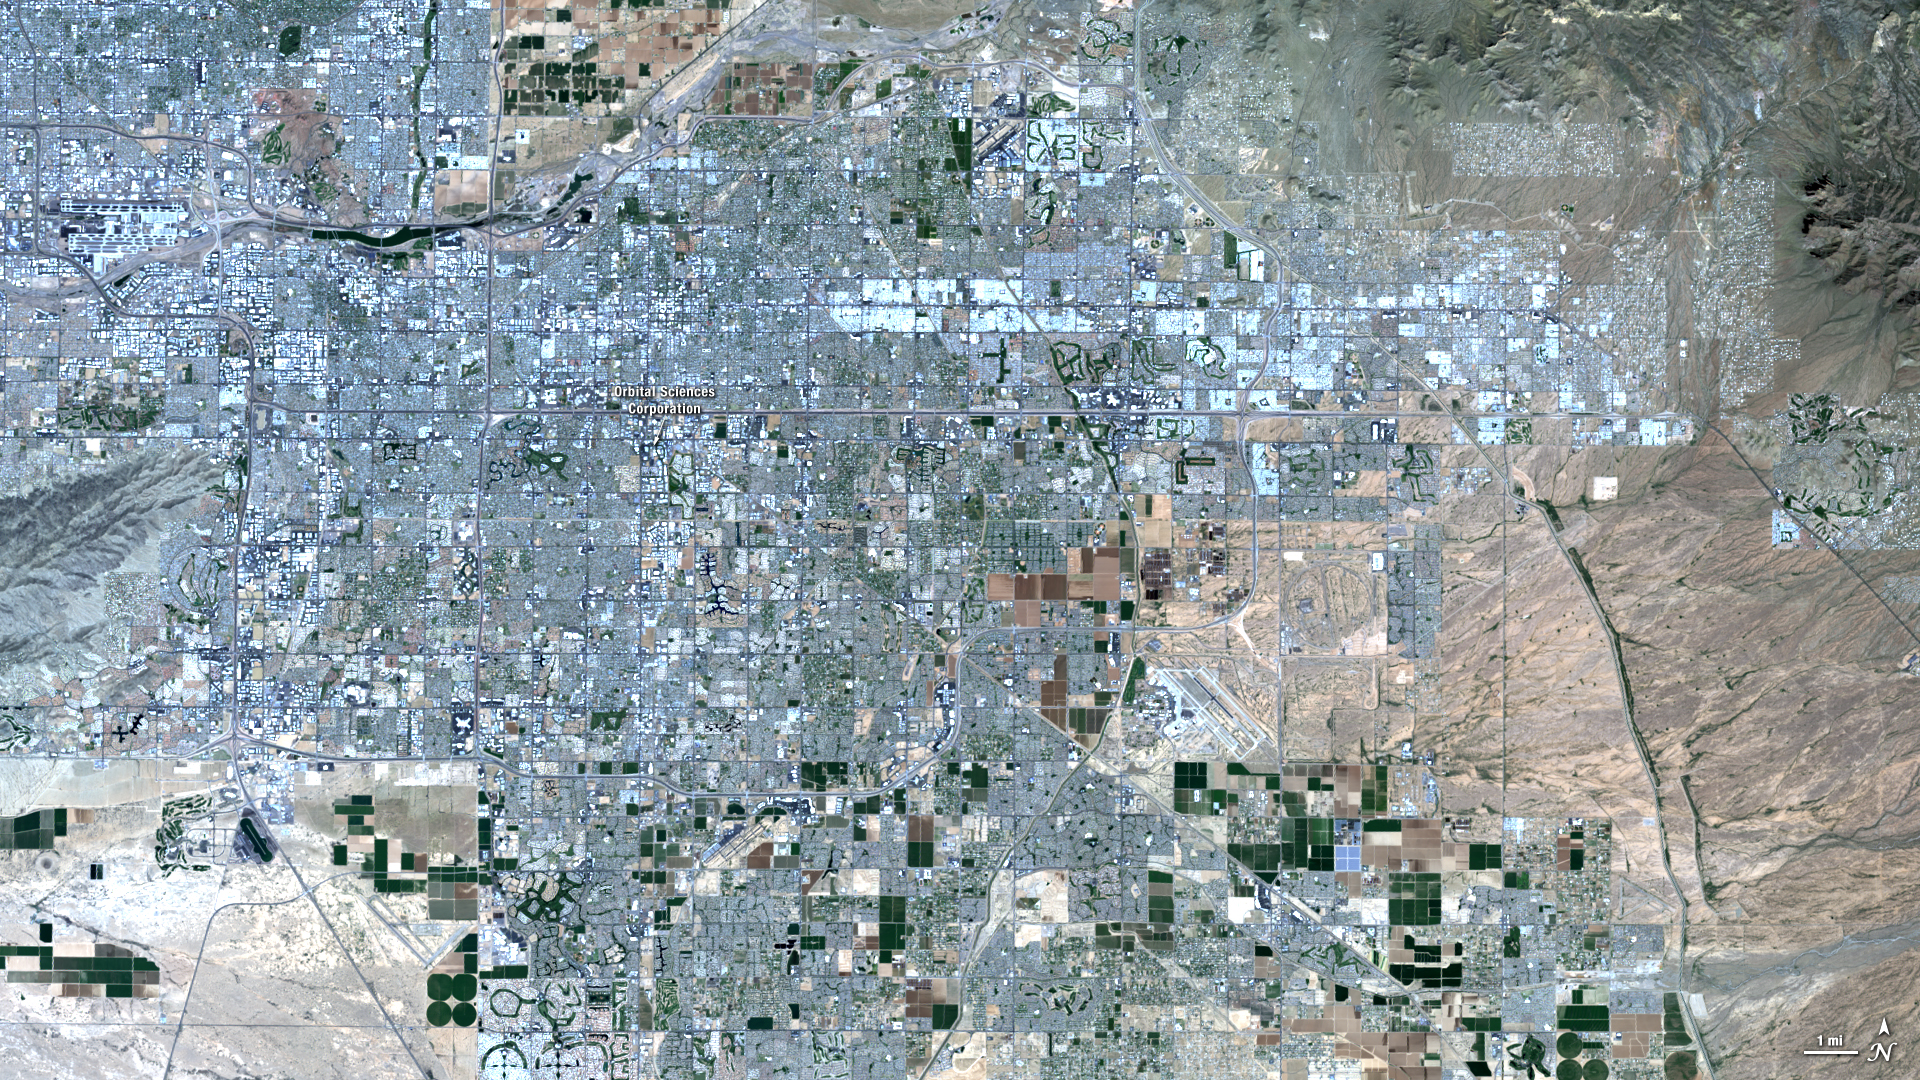 Ldcm Satellite Sees Its Birthplaces Nasa